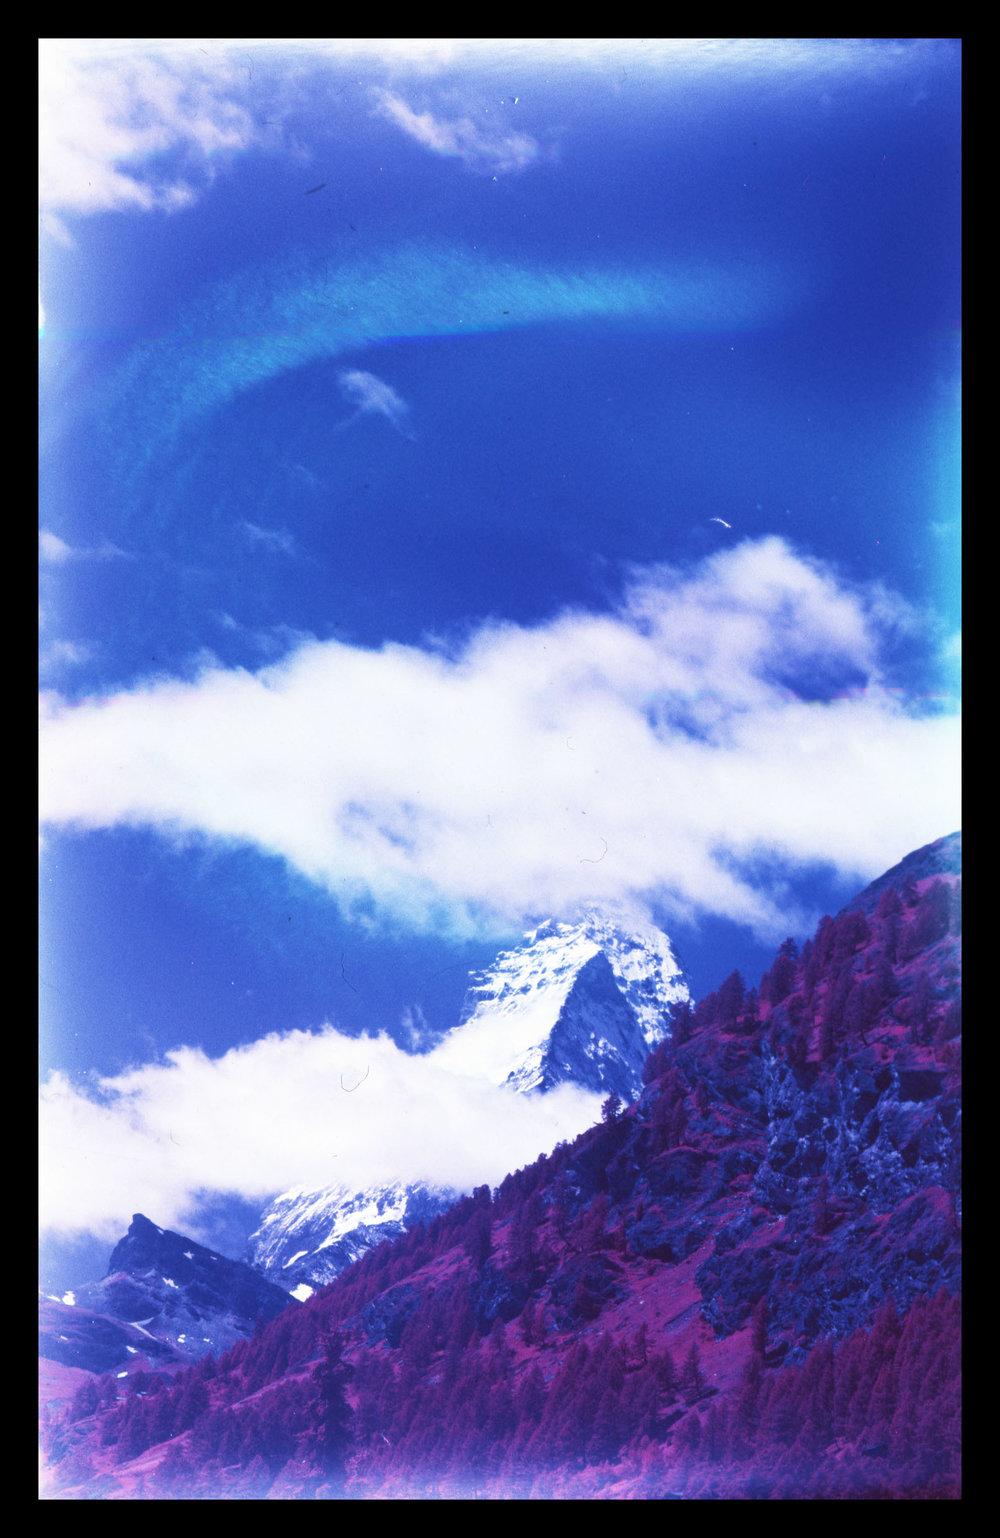 The Matterhorn, Zermatt, Switzerland